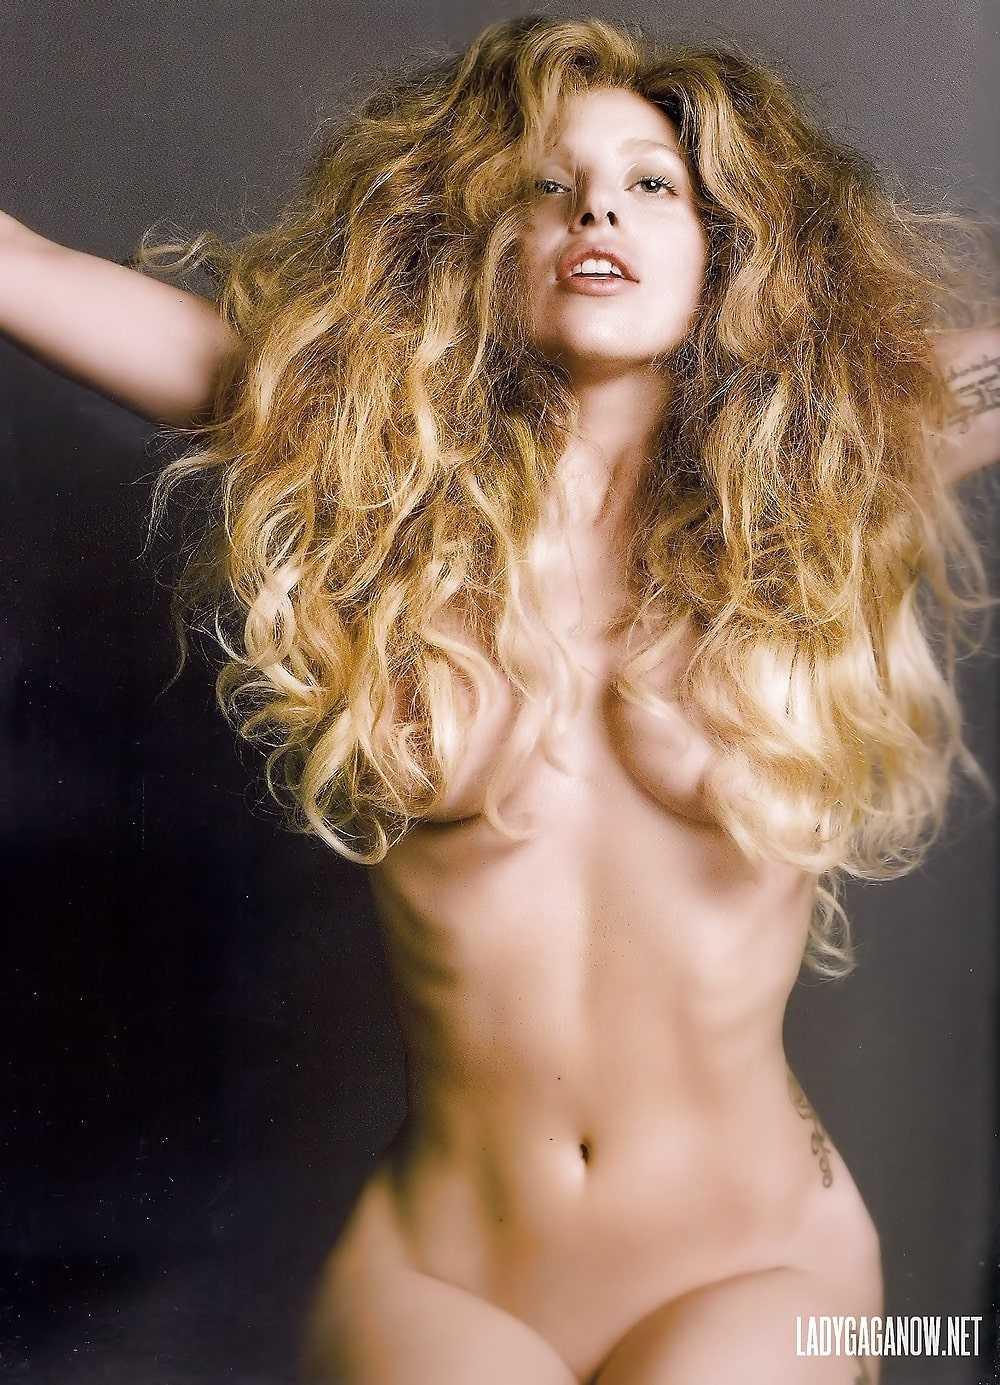 Lady Gaga big tits pic